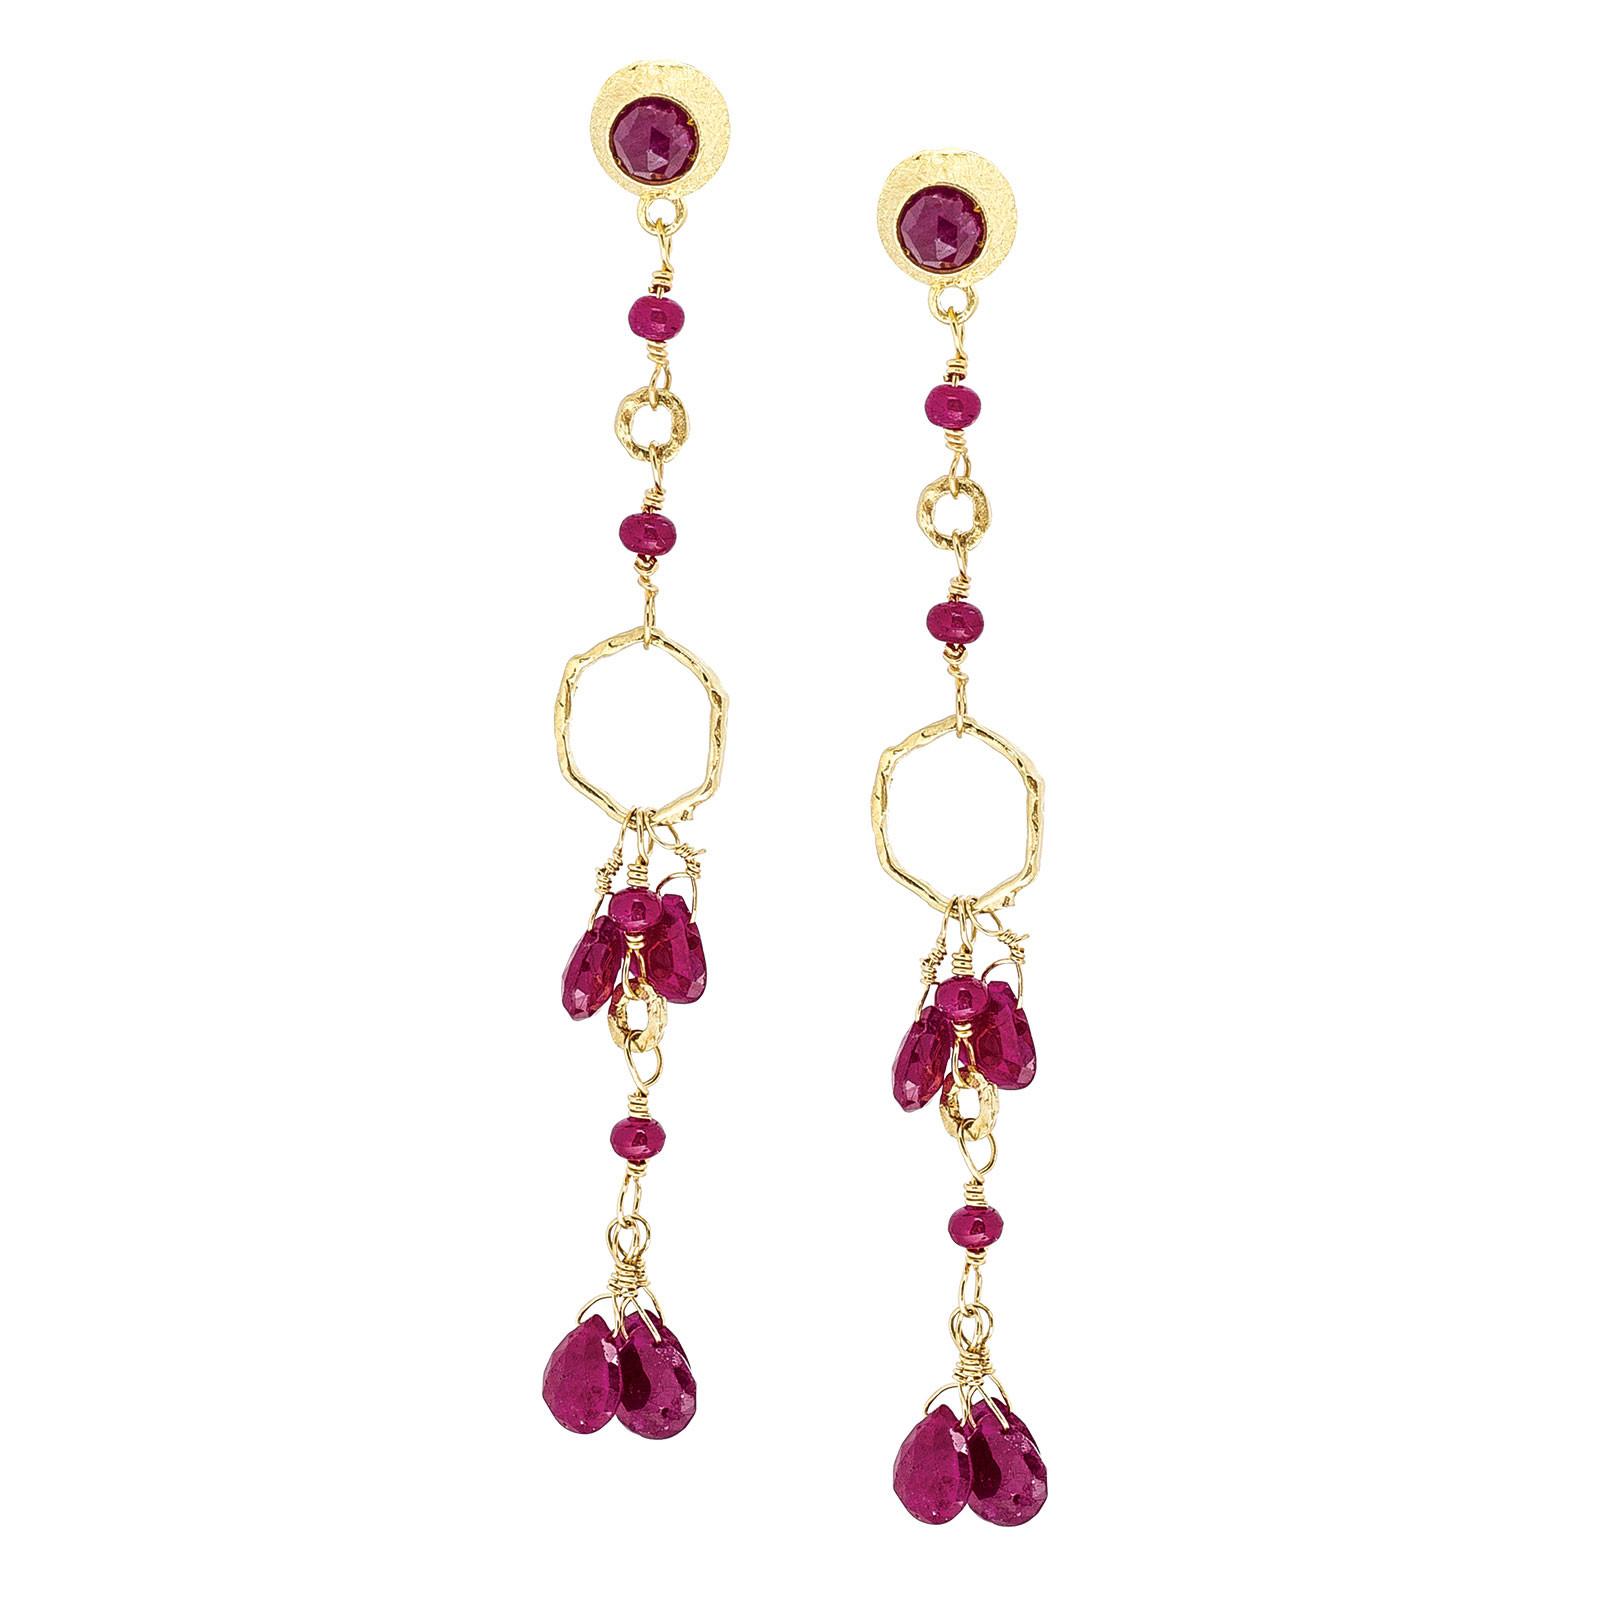 Vintage Ruby Chandelier Earrings